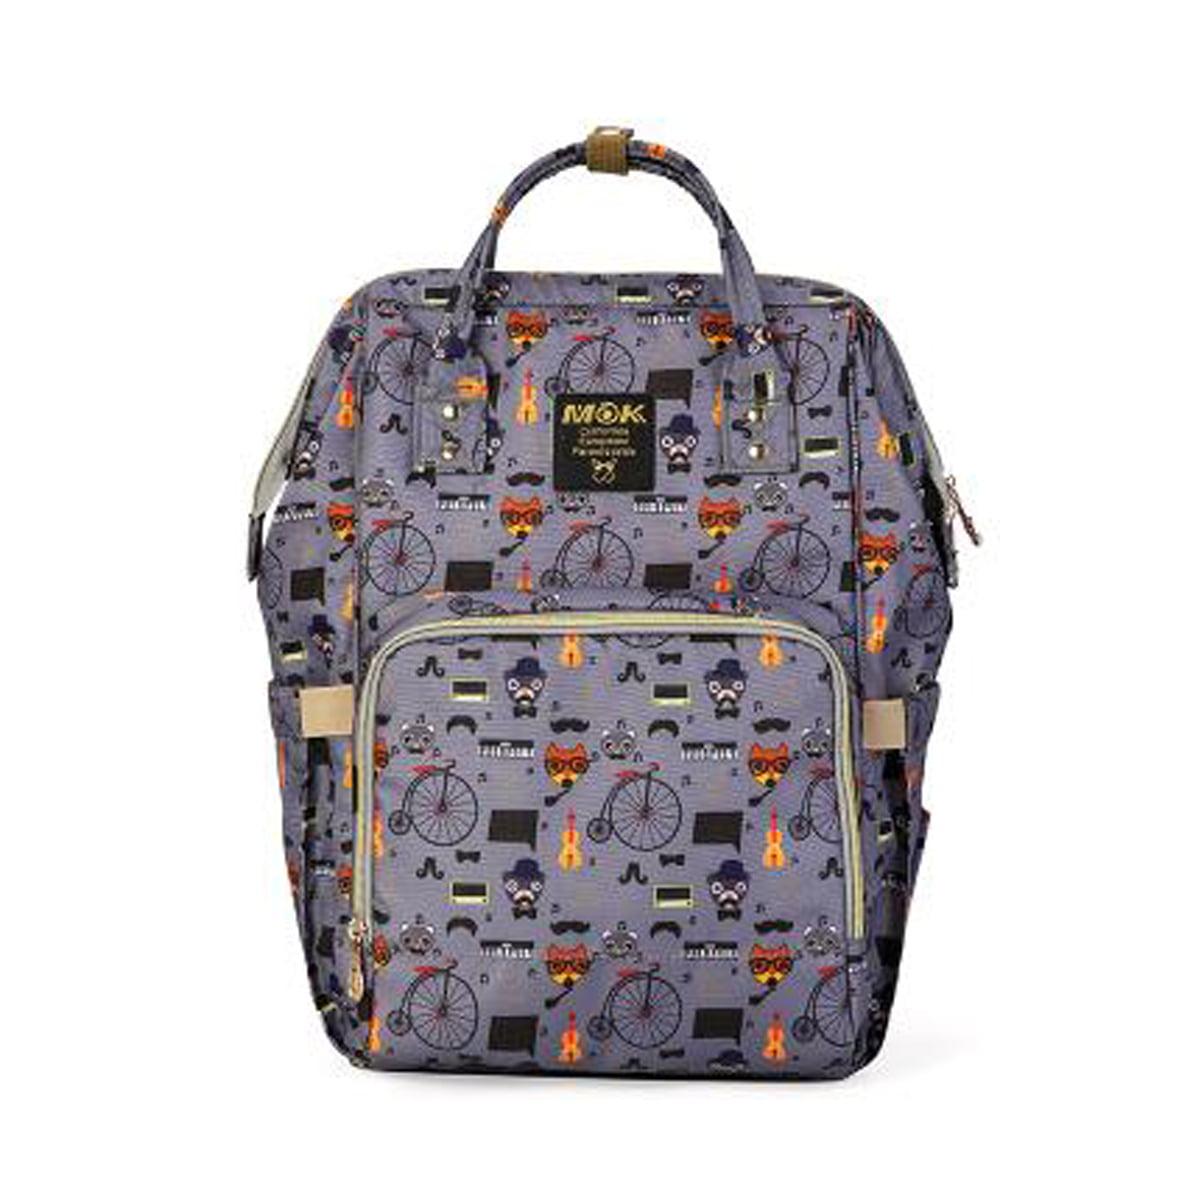 048 Purple Backpack Multifunctional Mummy Baby Diaper Nappy Changing Bags Backpack Handbag 048